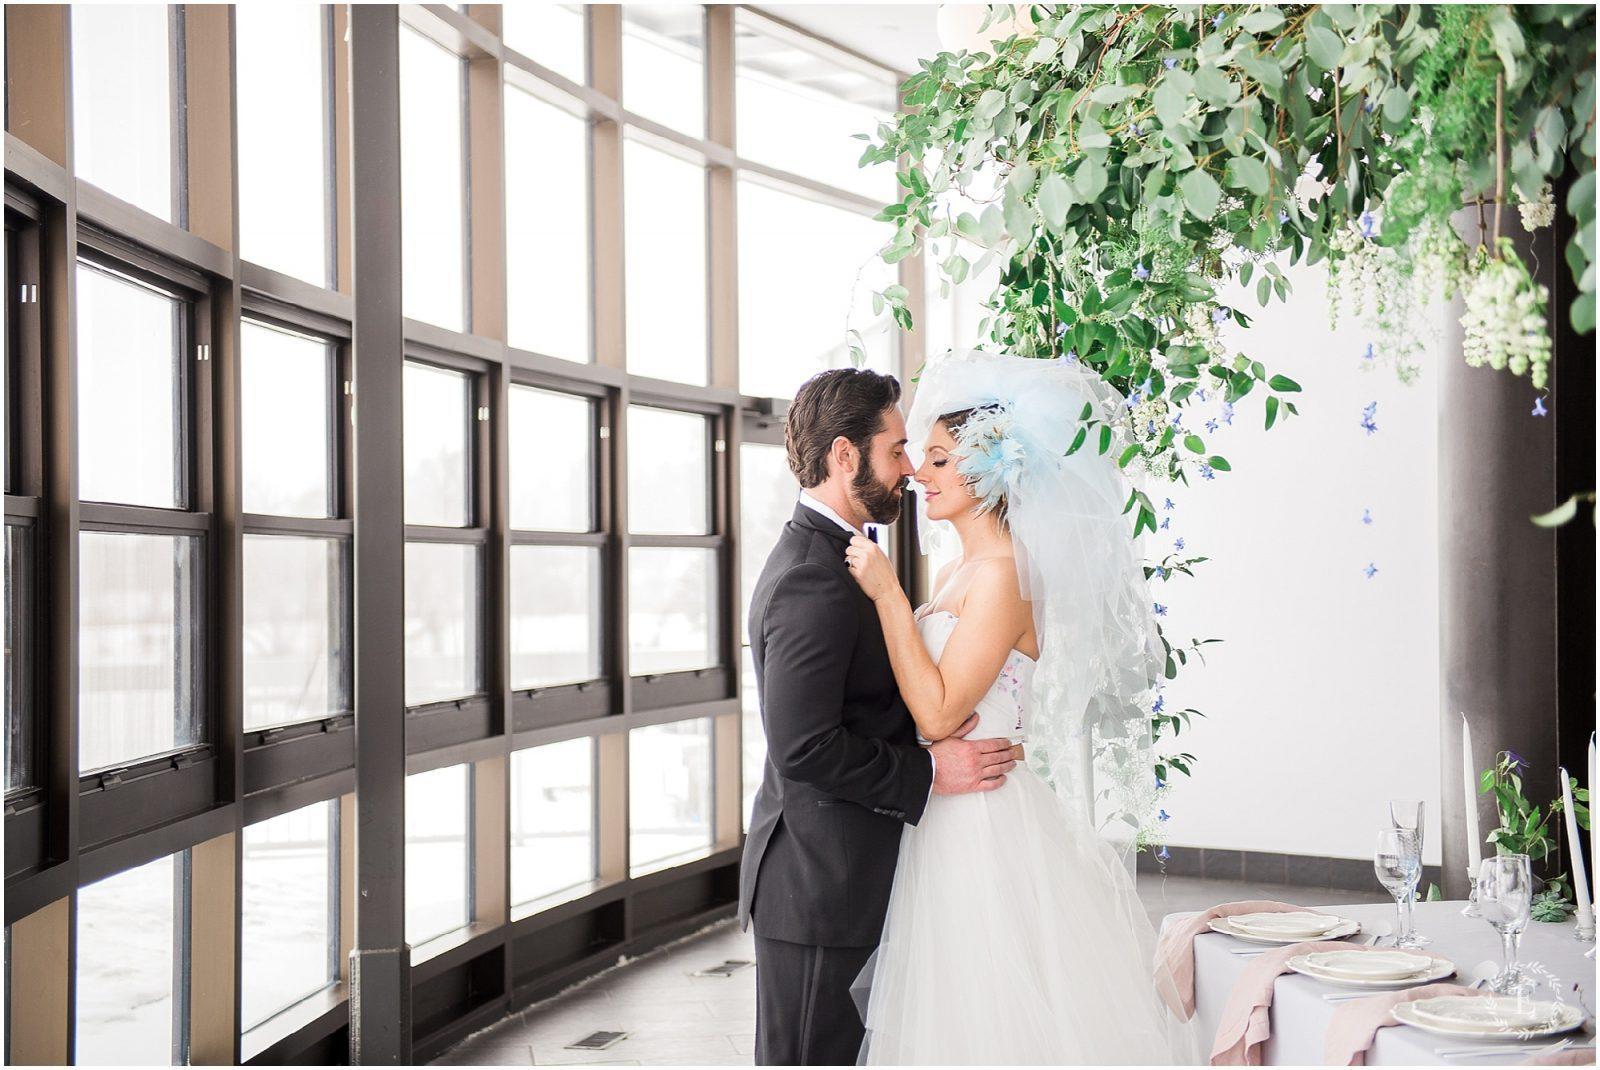 154 Carrie-John-Wedding-Styled-shoot-sex and the city-photosbyemmah.jpg